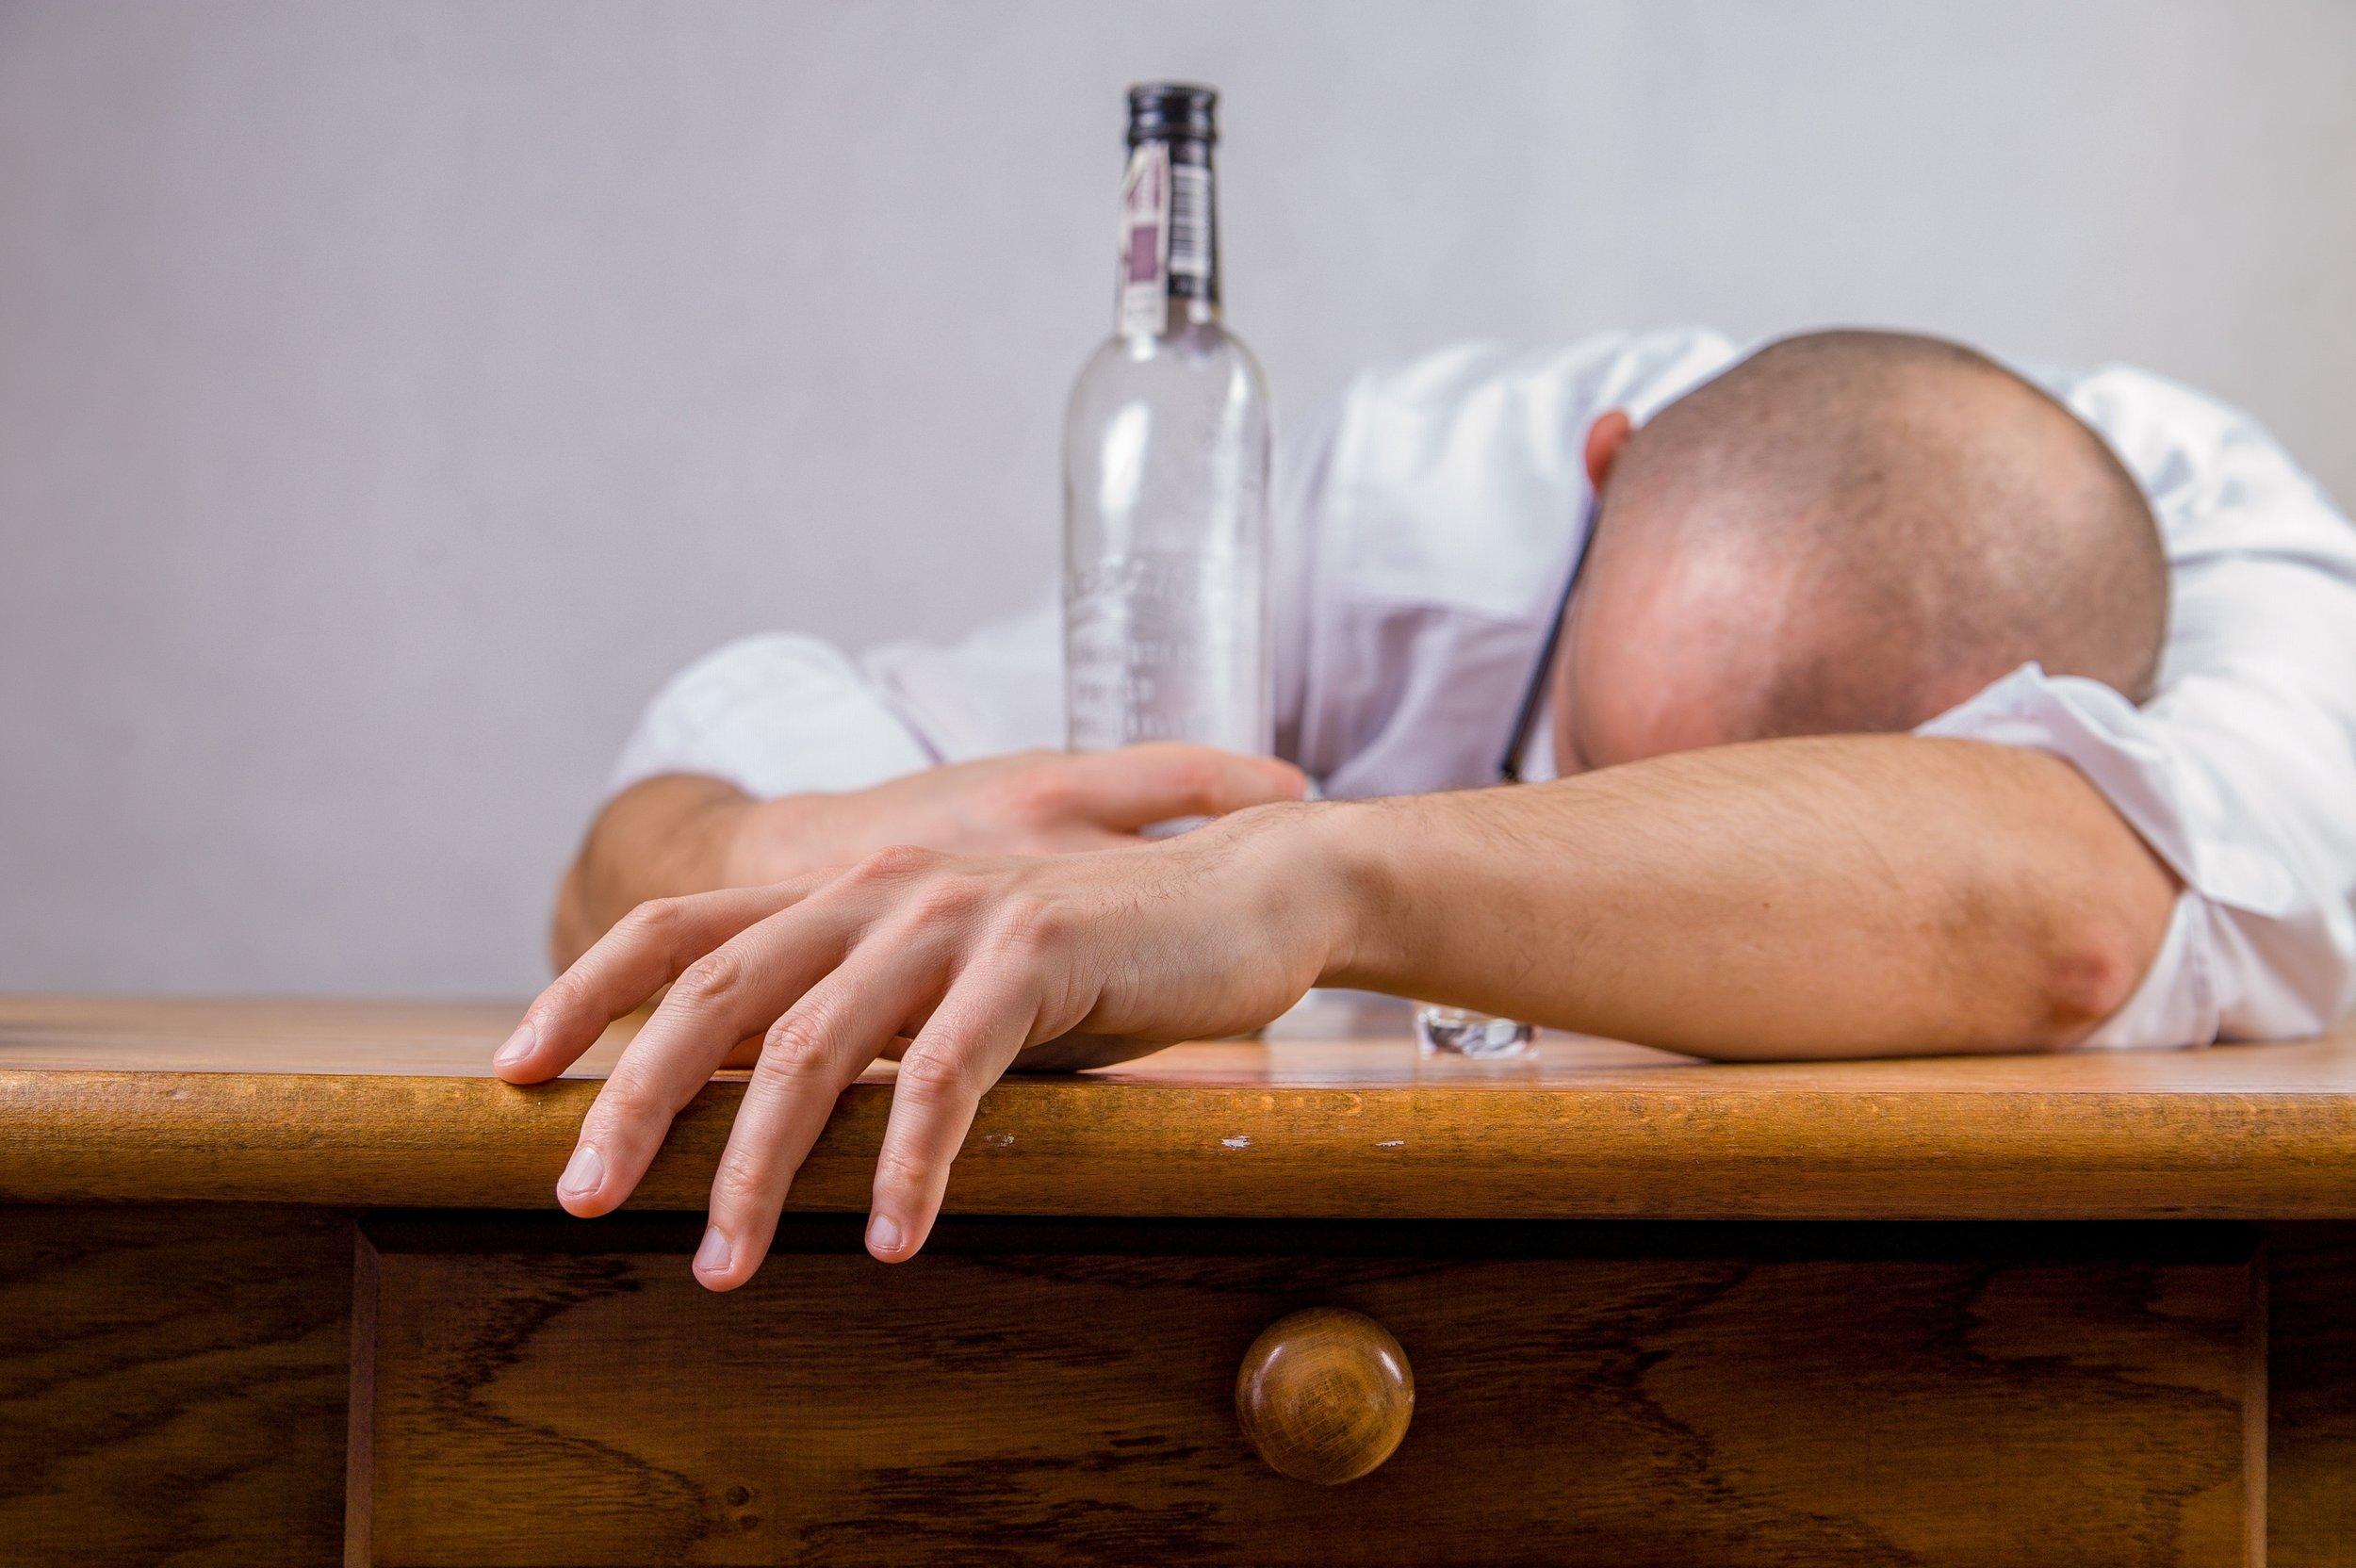 alcohol-alcoholic-drunk-52507.jpg